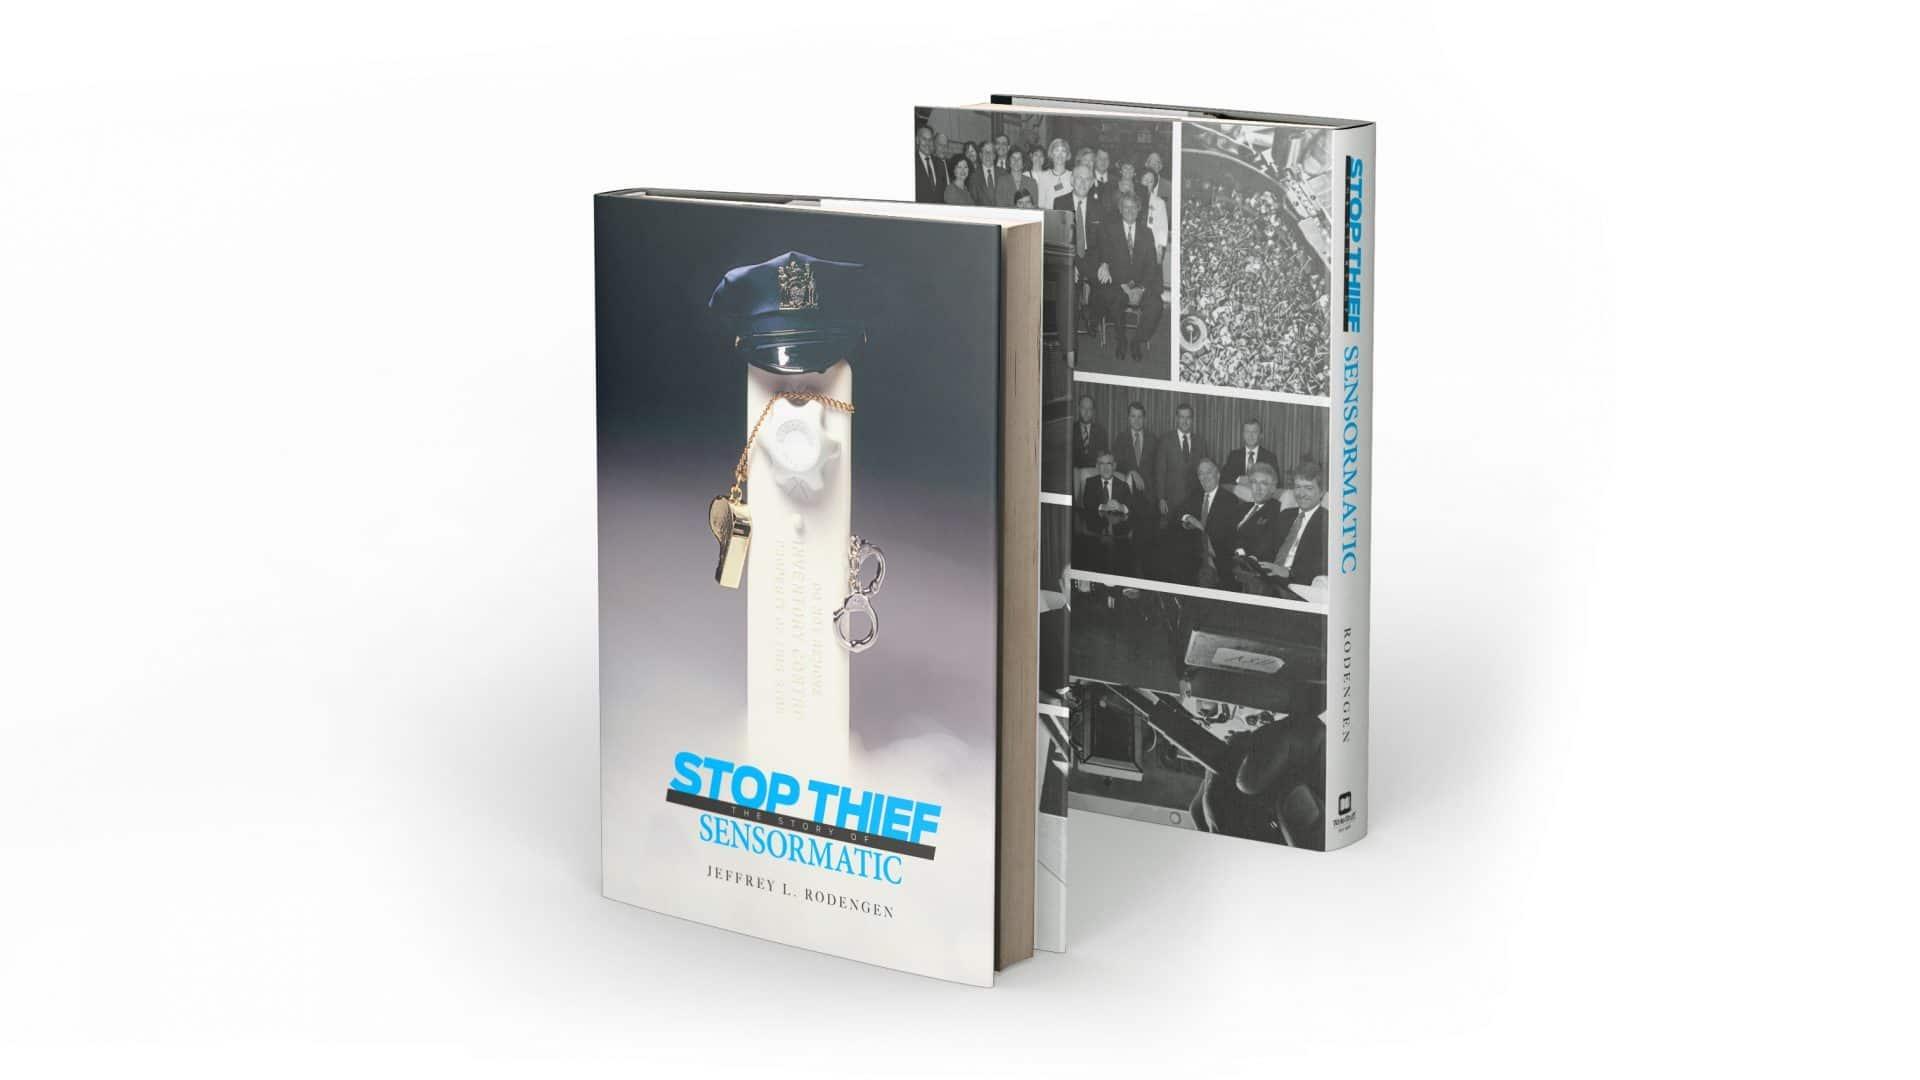 Sensormatic Dust Jacket Hardback 04 e1520632104685 Short Run Books